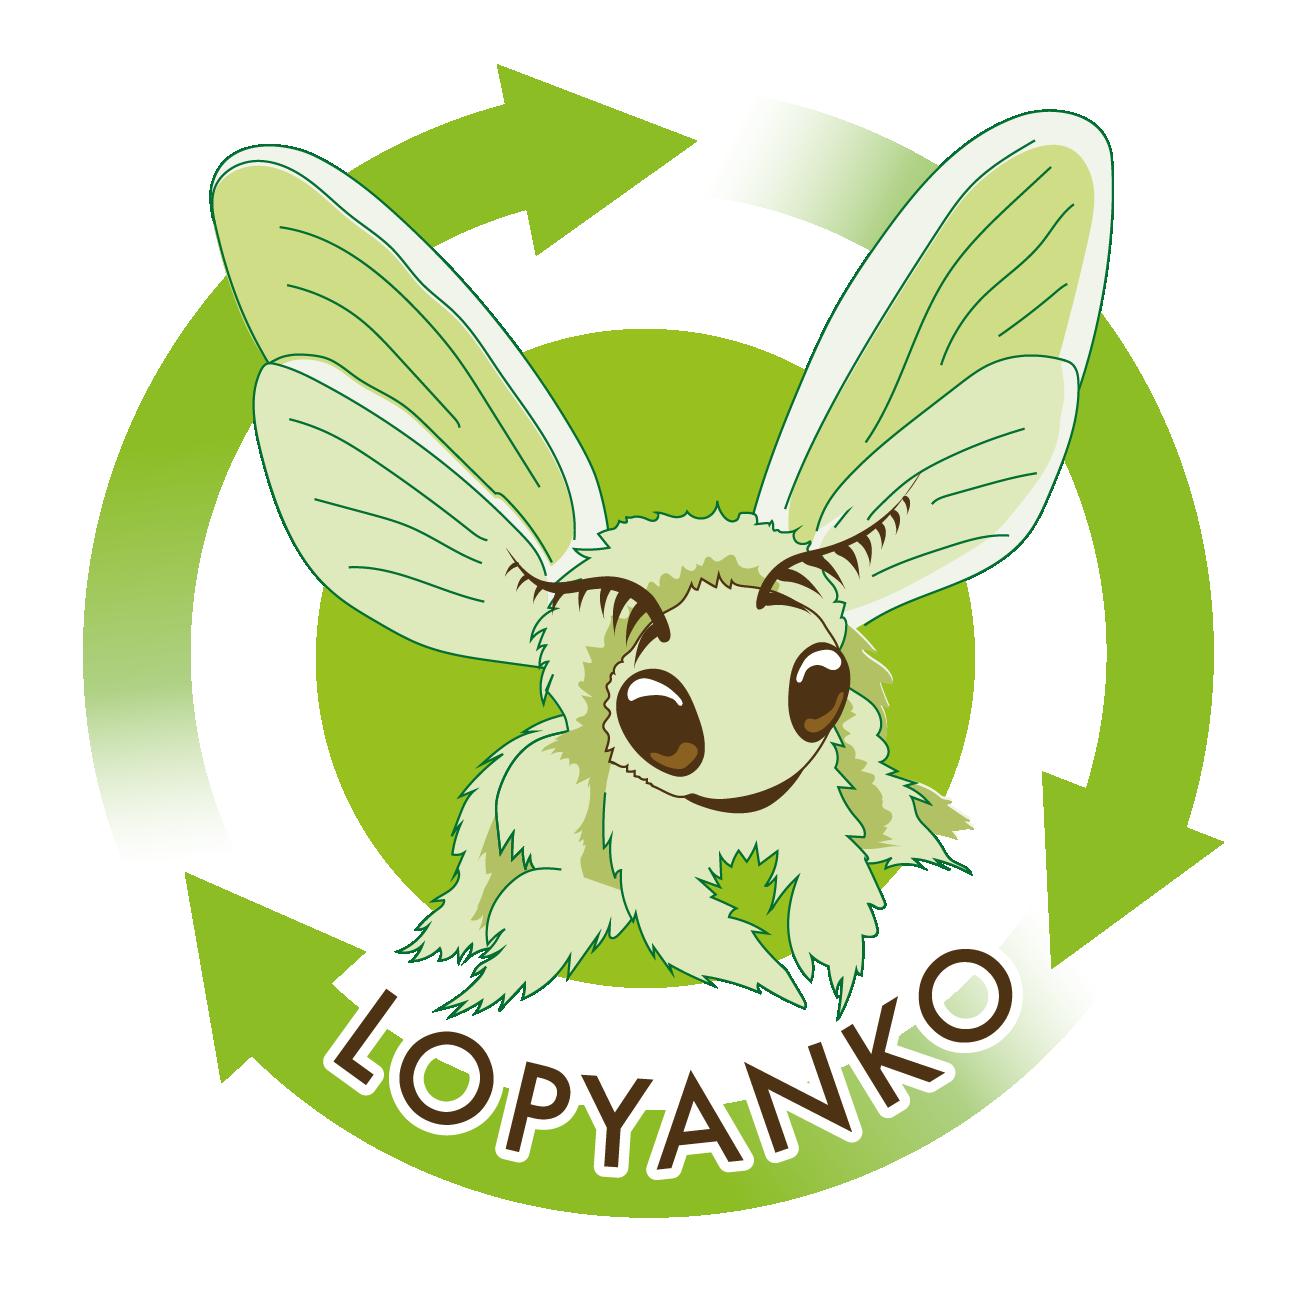 Bio company lopyanko . Gardening clipart insect garden